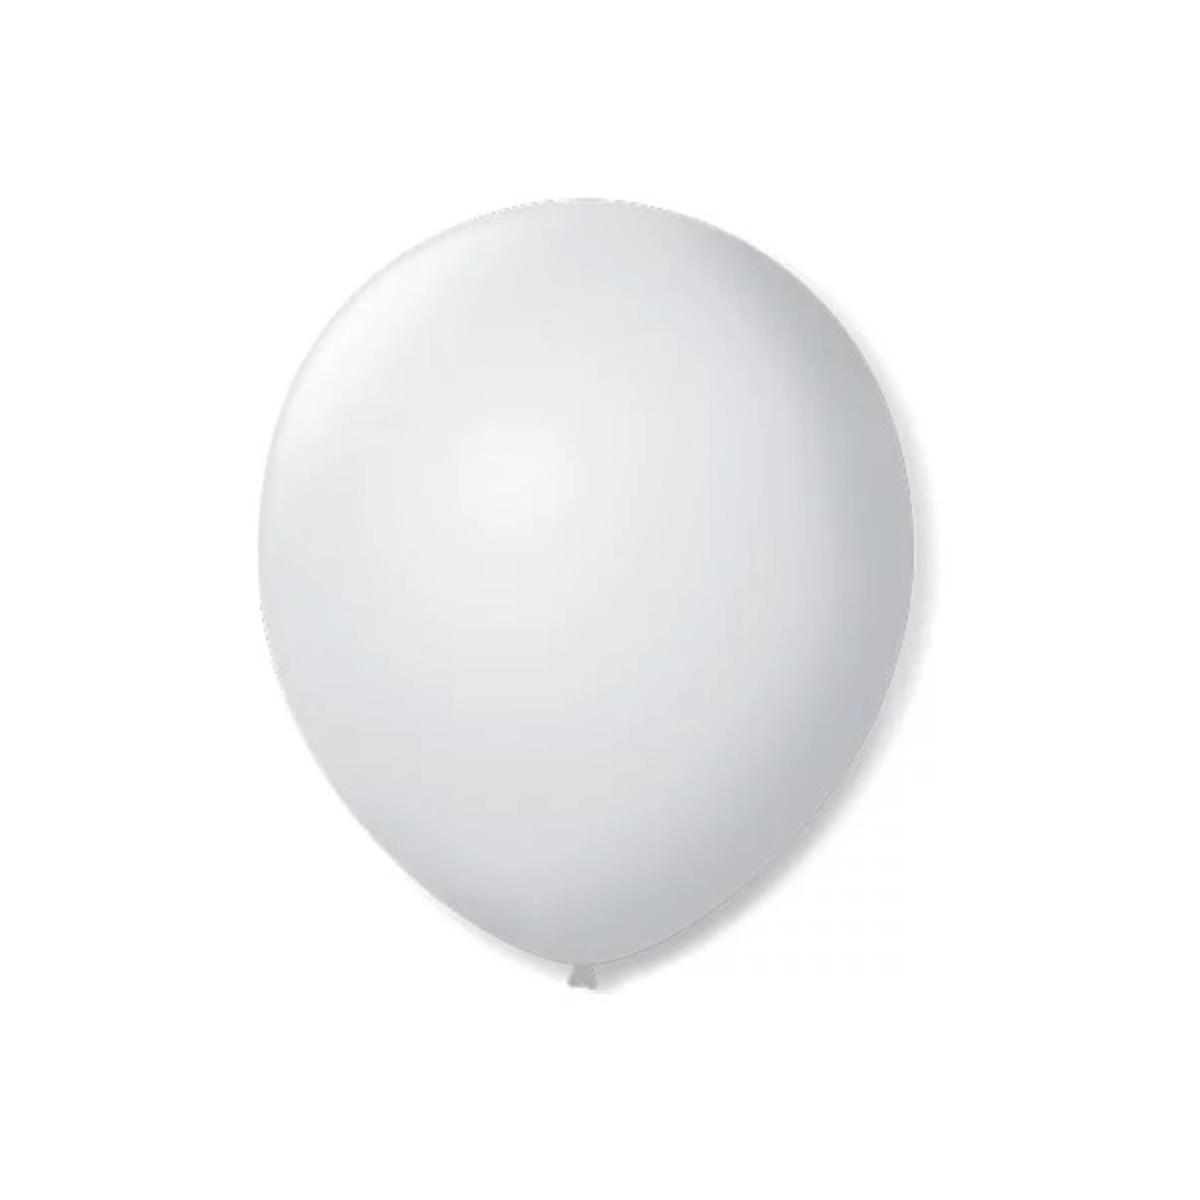 50 Unid Balão Bexiga Látex Branco Tamanho 9